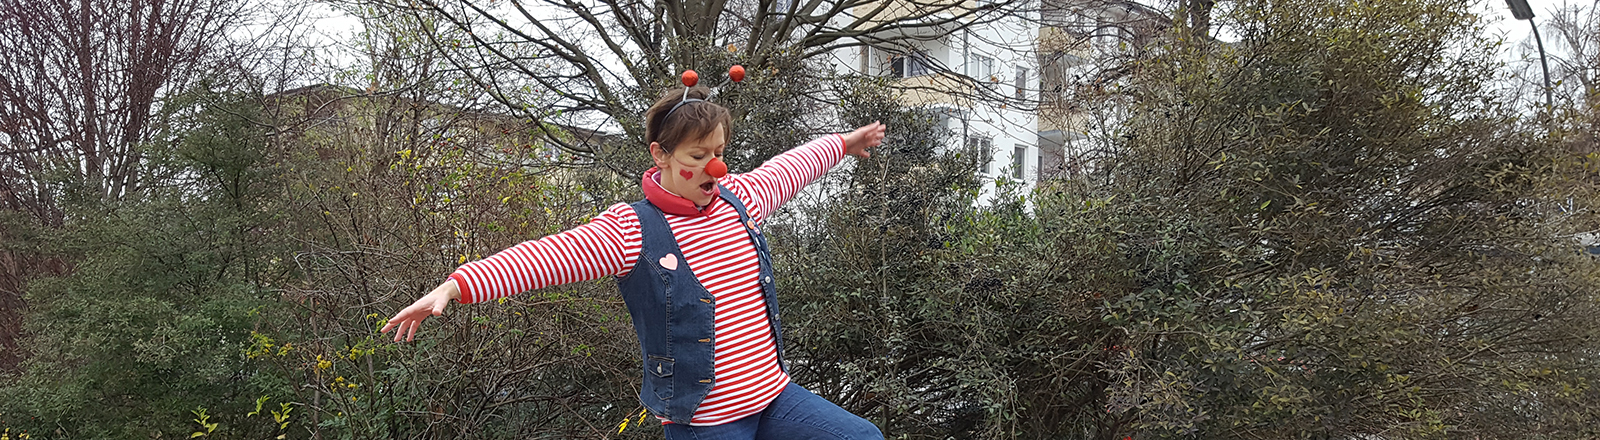 Frau im Clown-Kostüm auf roter Bank